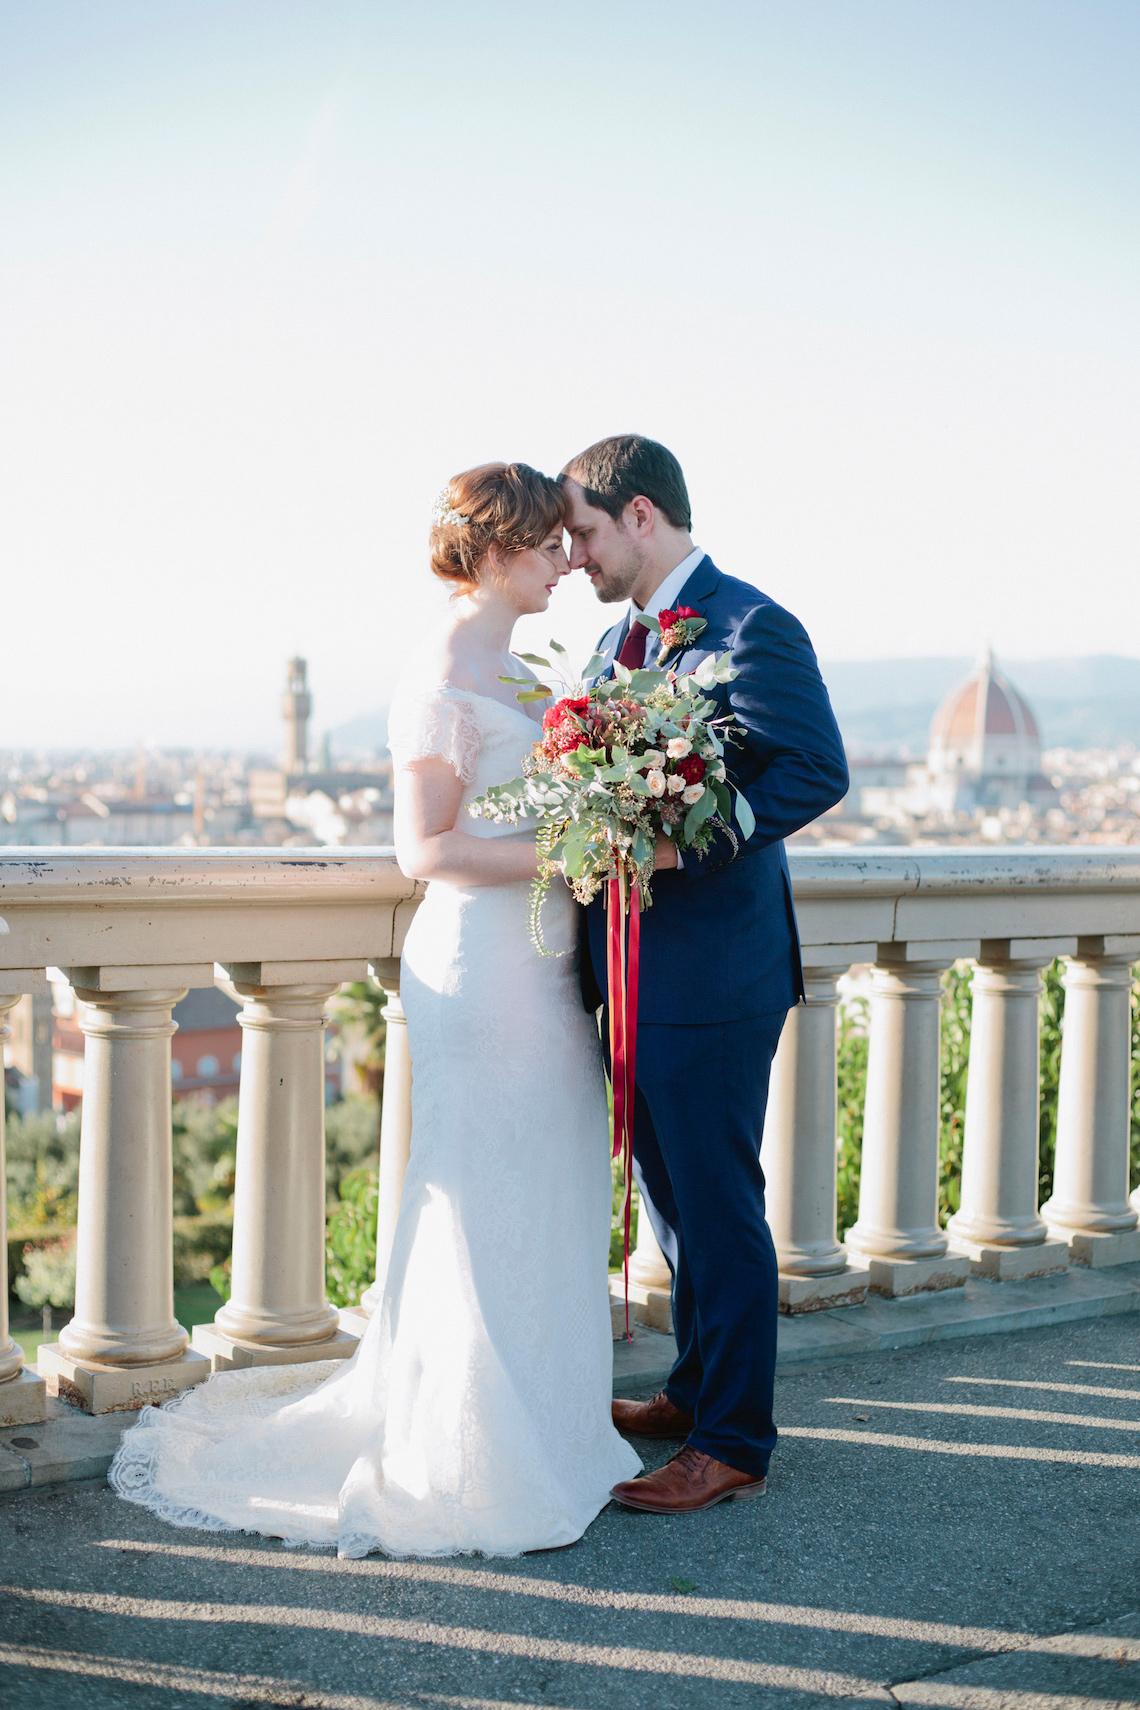 Rustic & Glamorous Tuscan Elopement | Purewhite Photography 36